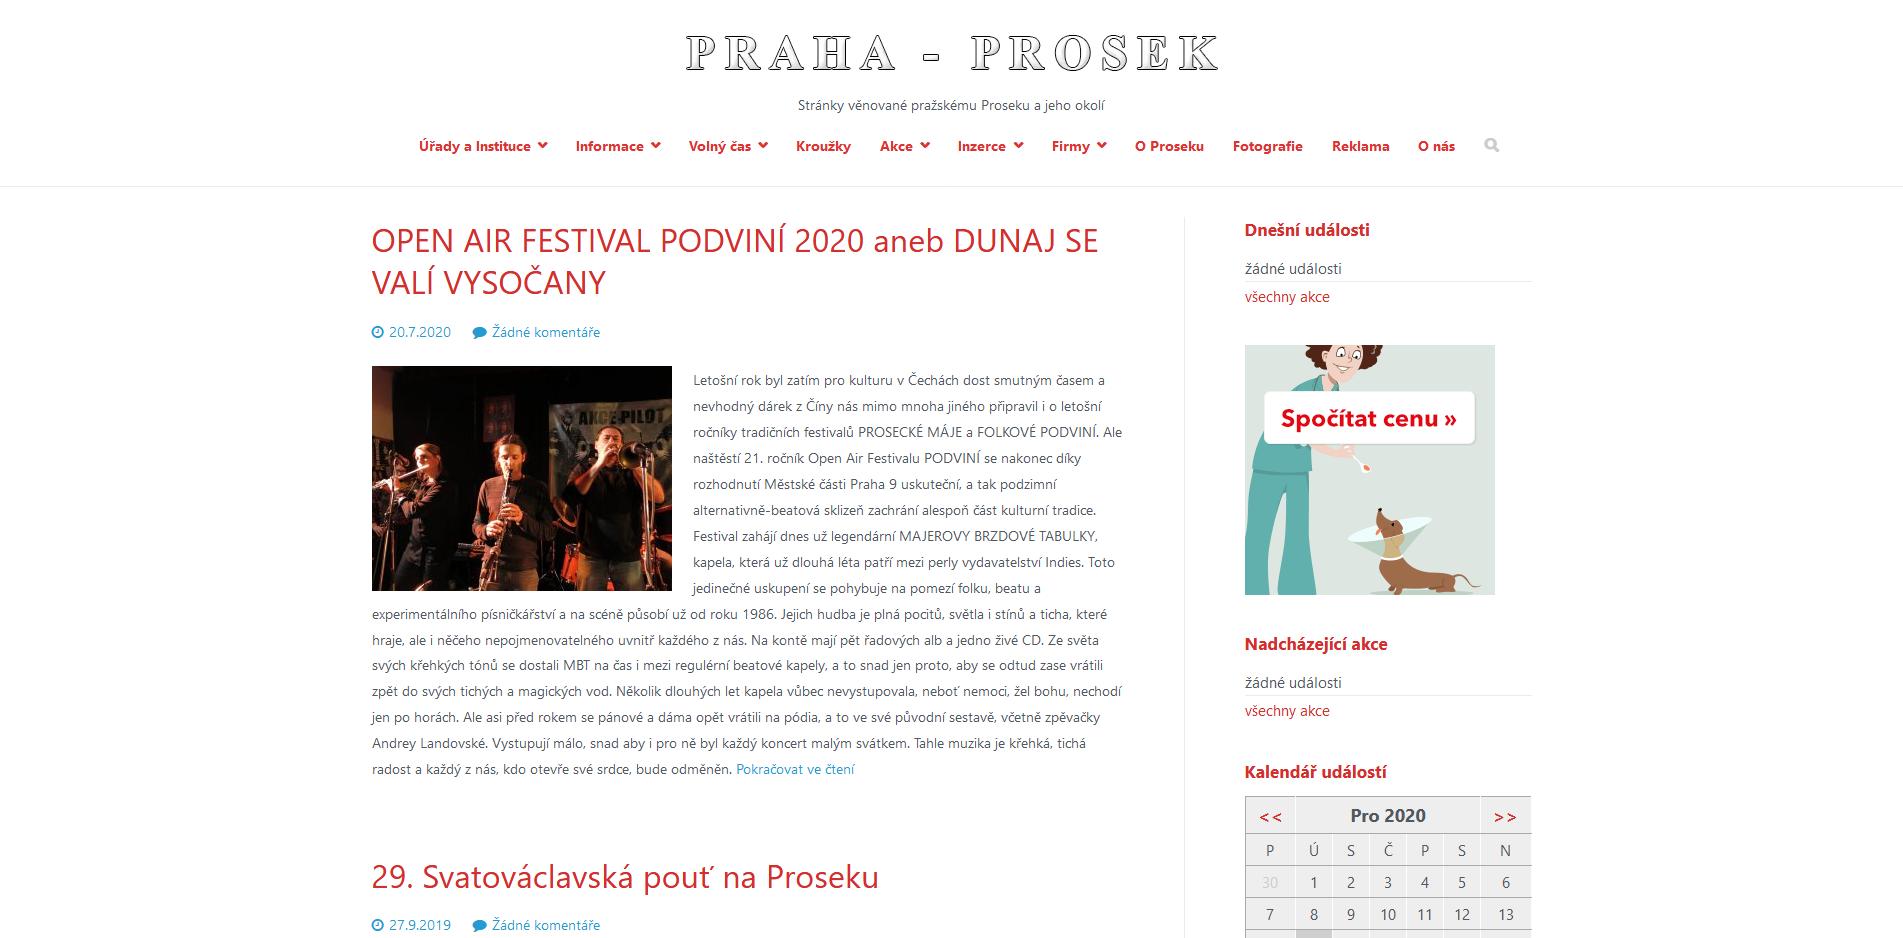 Praha-Prosek cz